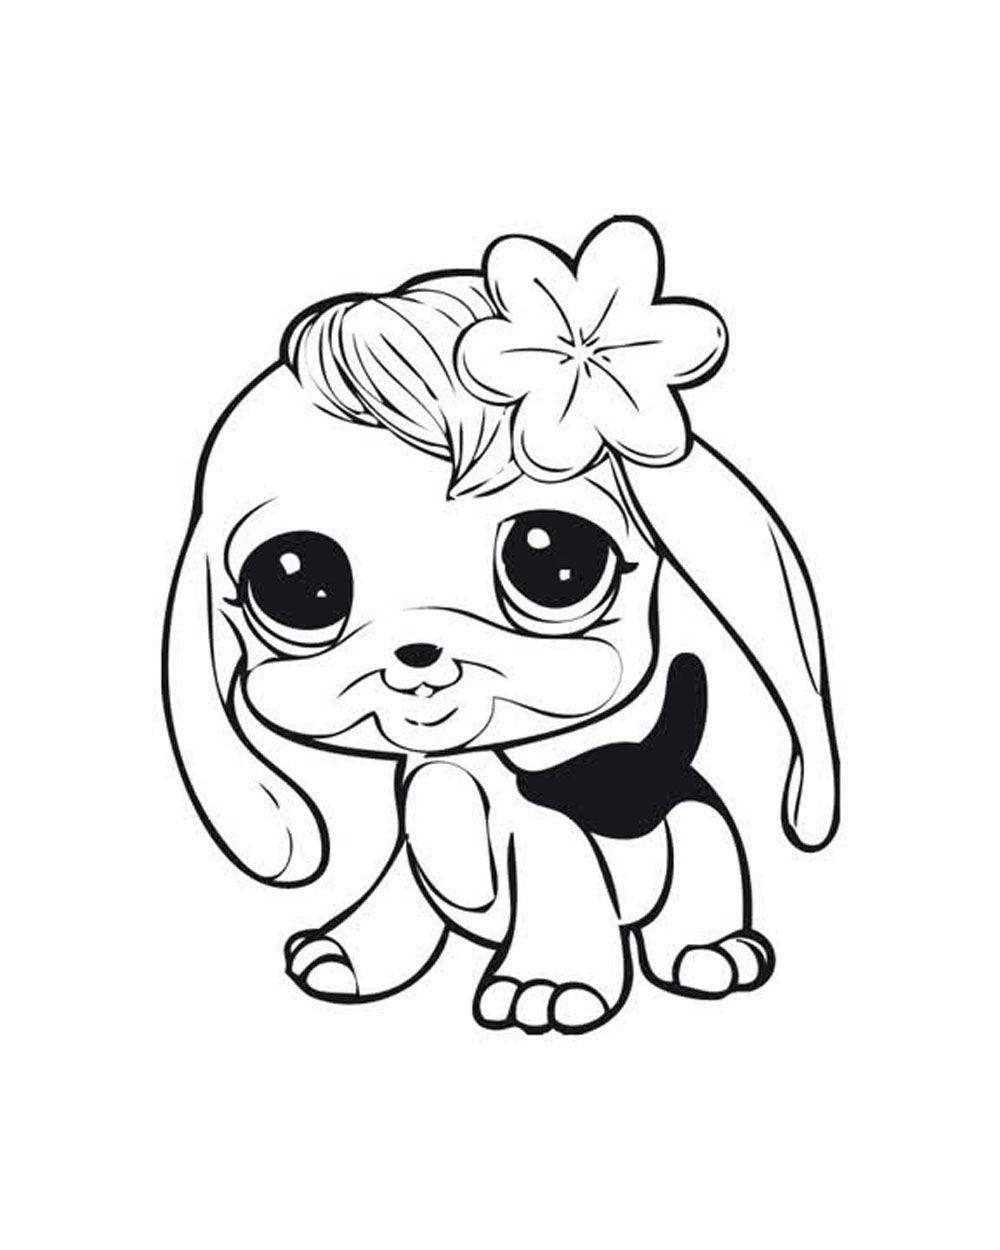 1000x1250 Fabulous Littlest Pet Shop Coloring Pages Free Download Printable